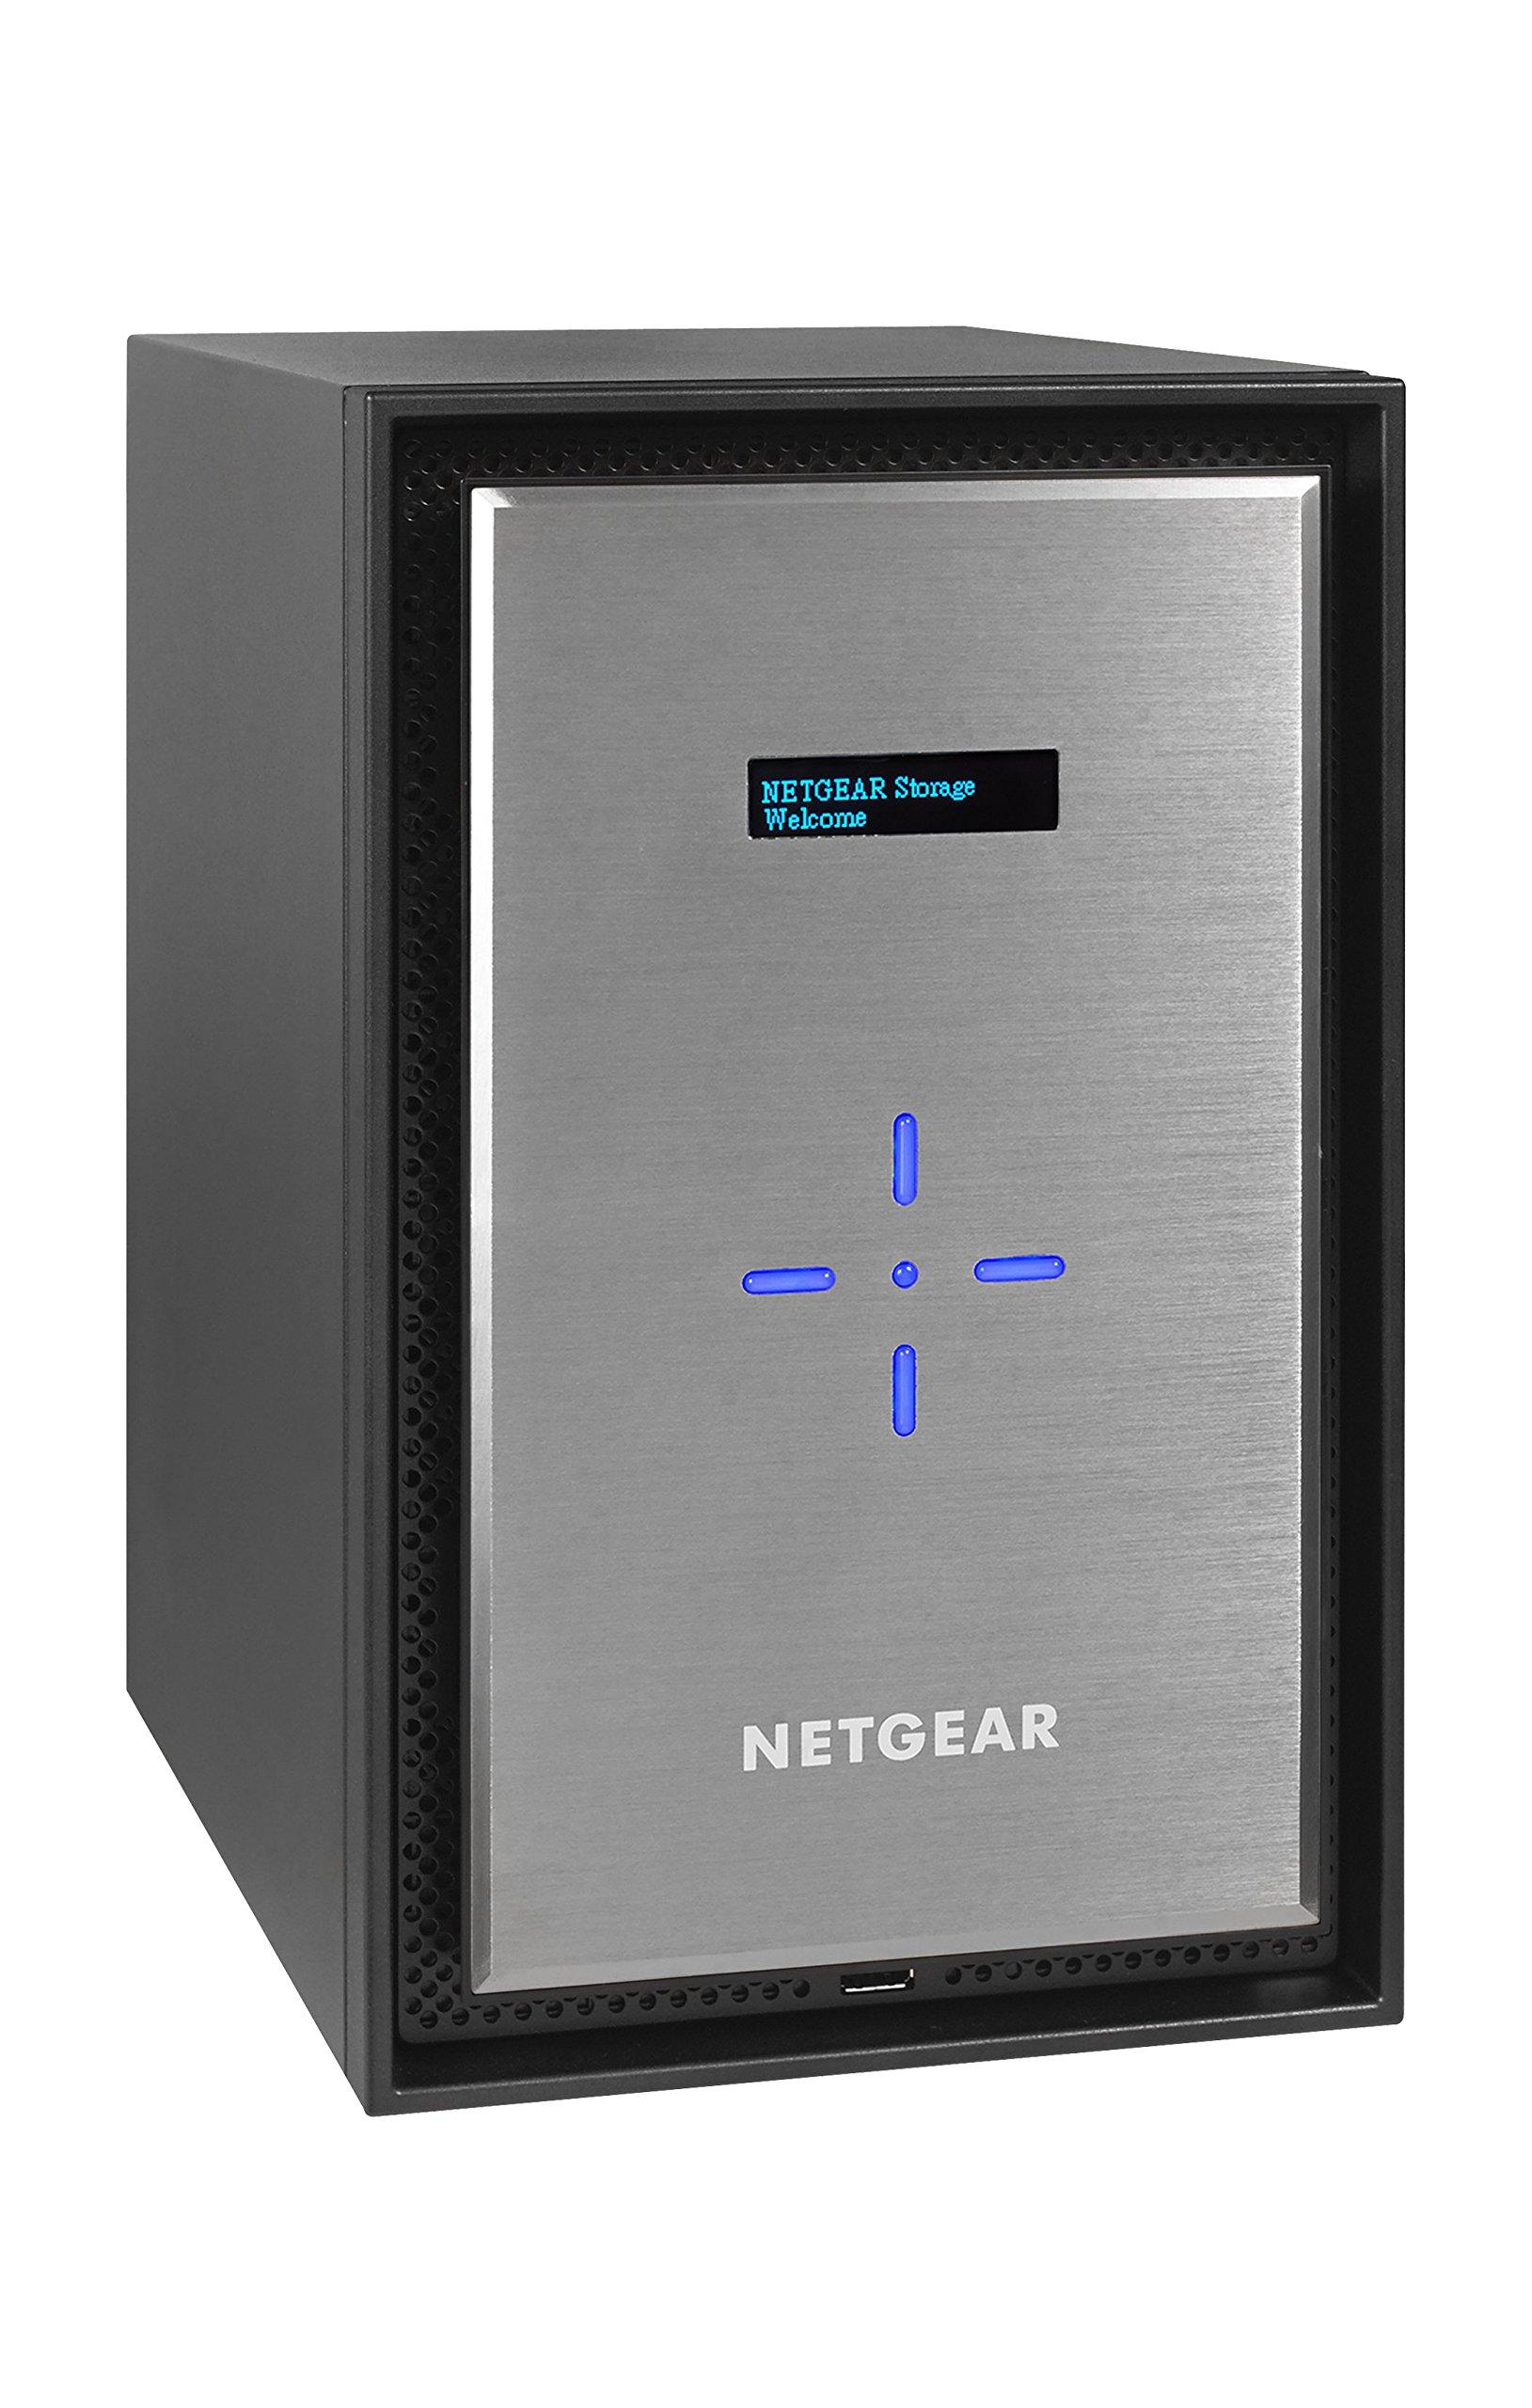 NETGEAR ReadyNAS RN628X 8 Bay Diskless Ultimate Performance NAS, 80TB Capacity Network Attached Storage, Intel Xeon 2.2GHz Quad Core Processor, 8GB RAM, RN628X00-100NES